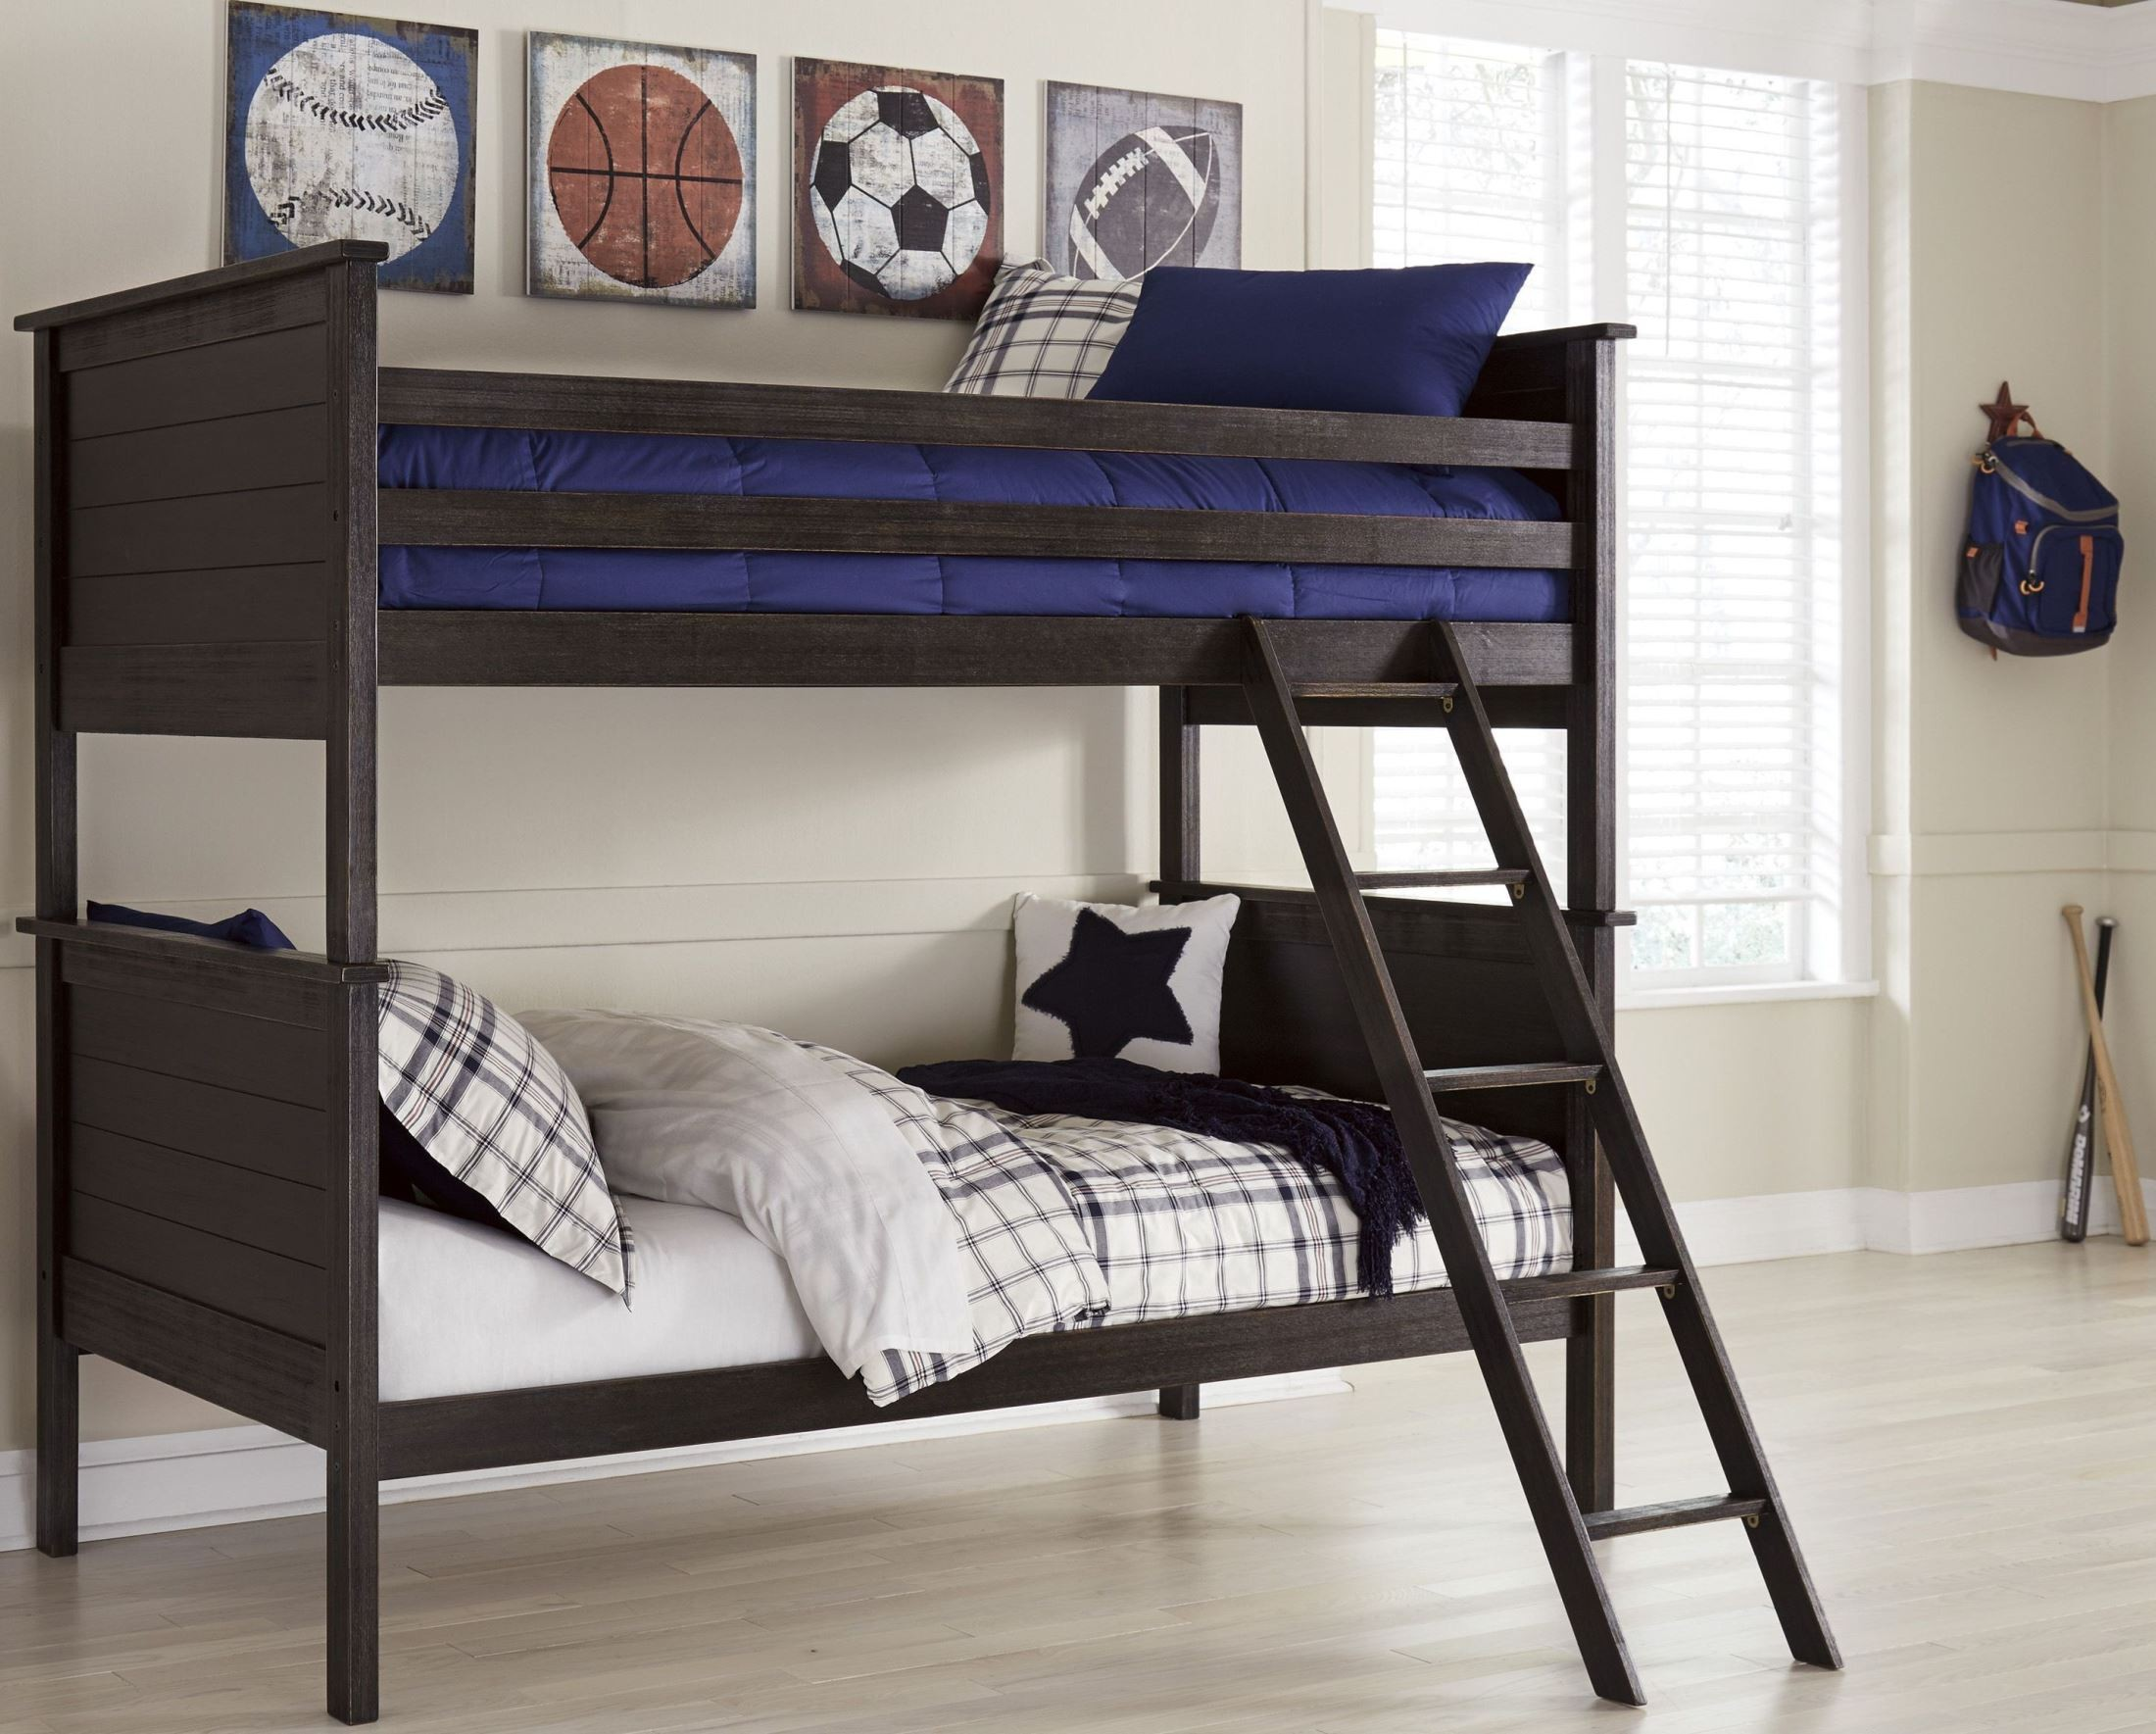 jaysom black bunk bedroom set b521 59p 59r 59s ashley